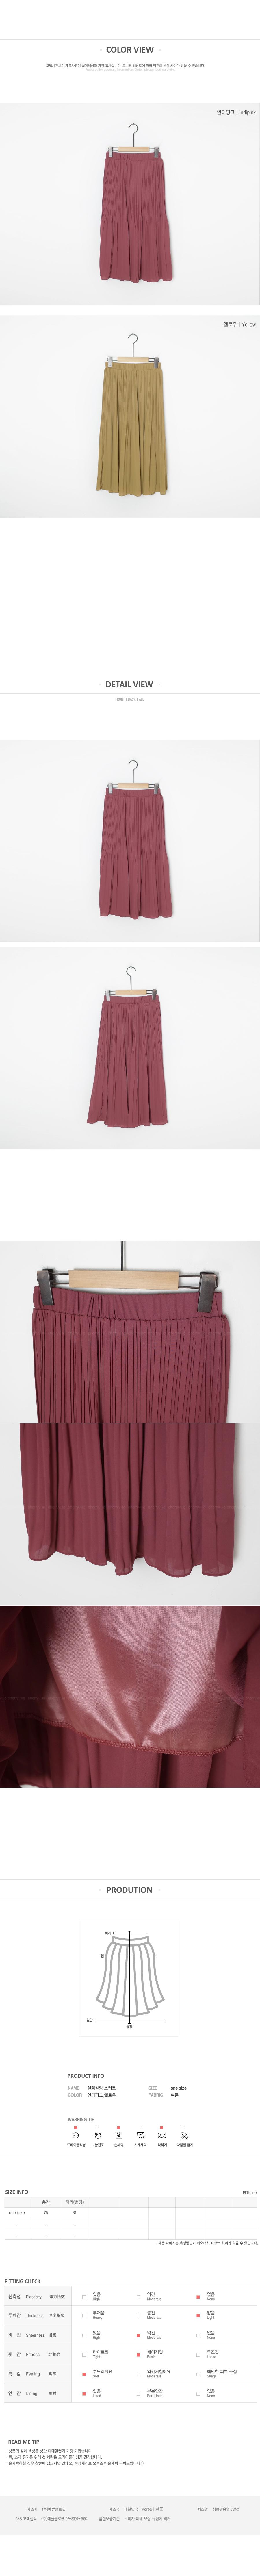 Shalam Sallan Skirt